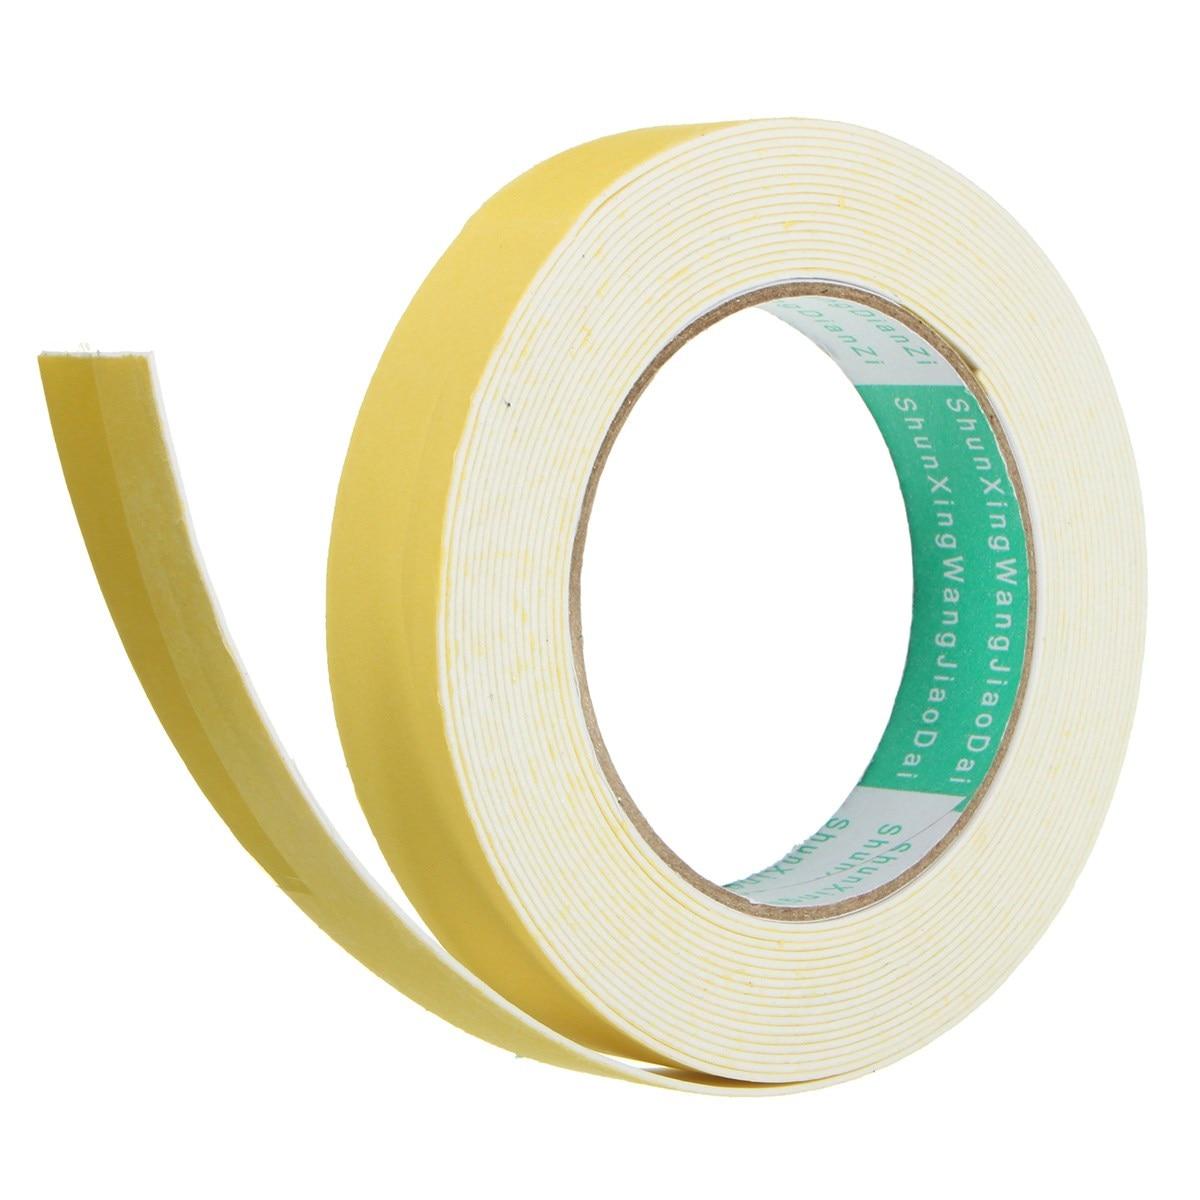 5M Roll 22MM White Adhesive Seal Strip Bath Shower Floor Sink Sealant Tape  EVA Quick clean. Popular Shower Sealant Buy Cheap Shower Sealant lots from China